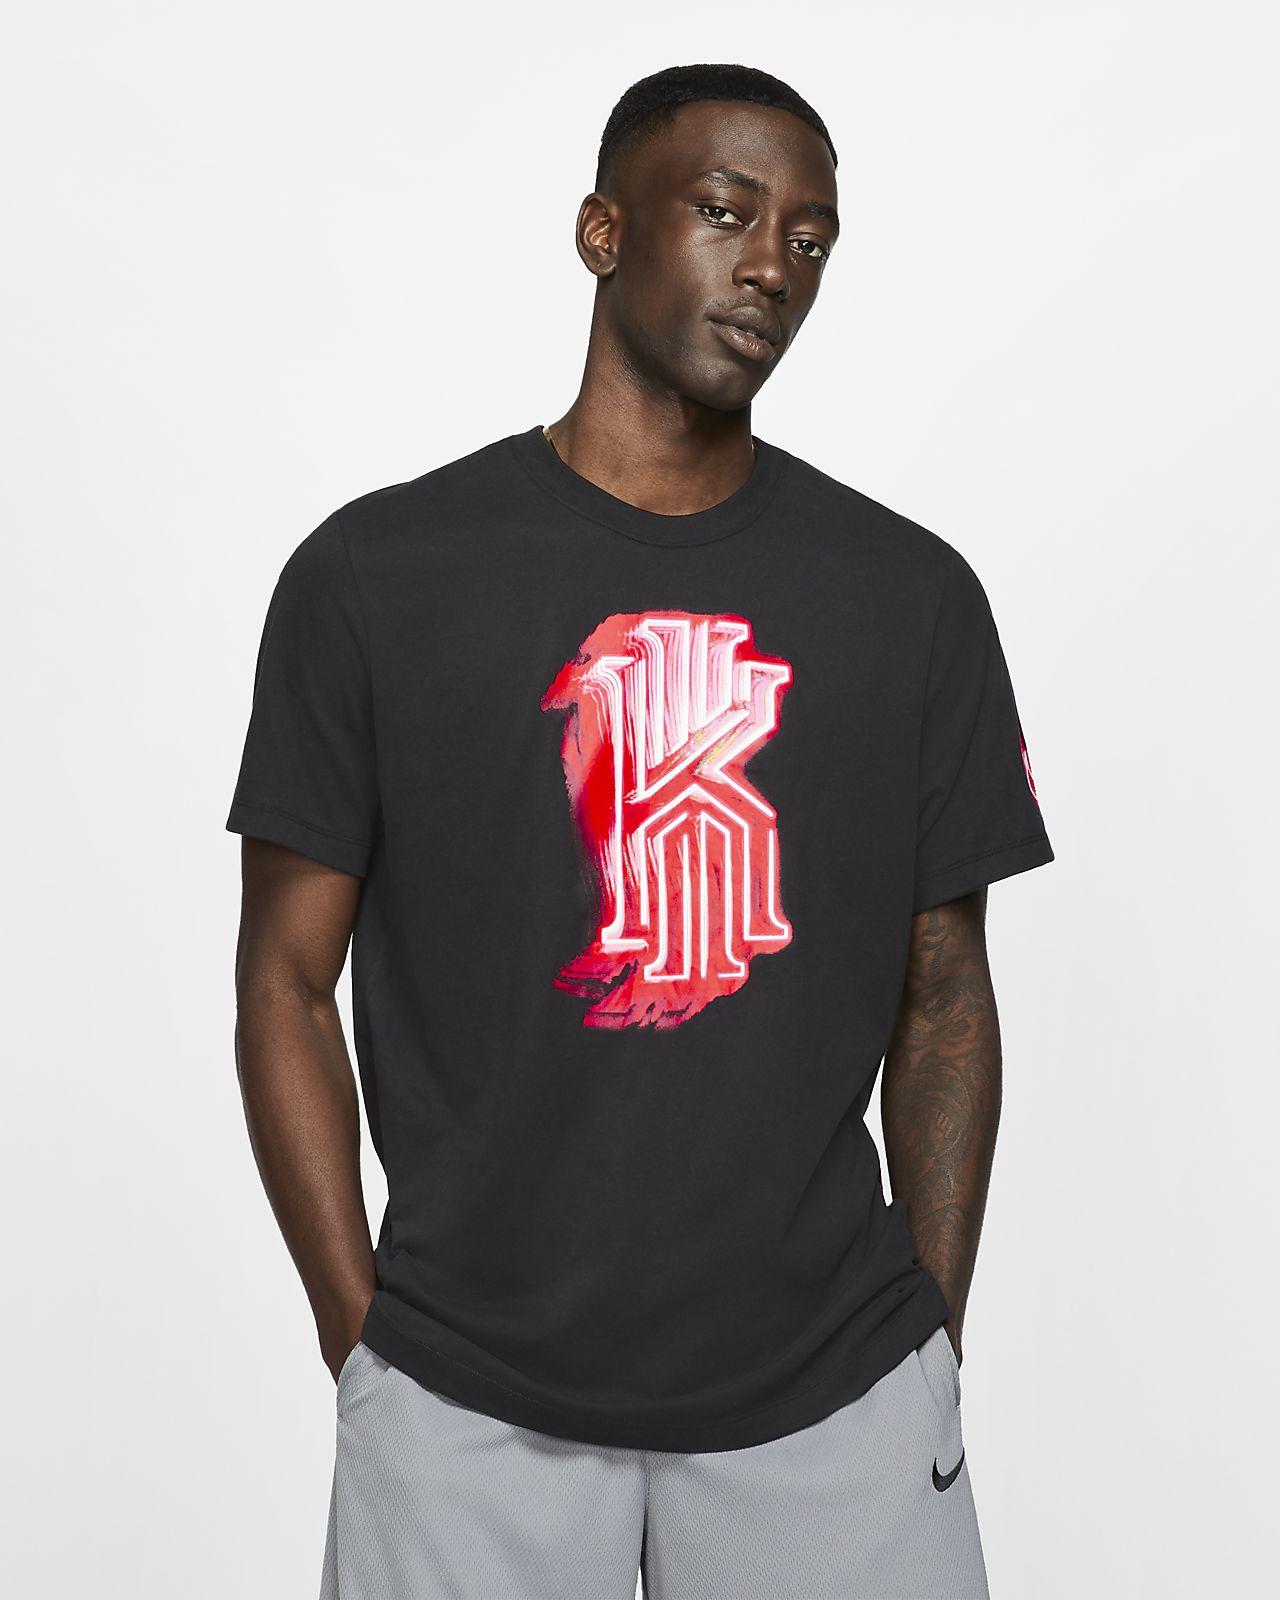 Nike Dri-FIT Kyrie T-shirt voor heren